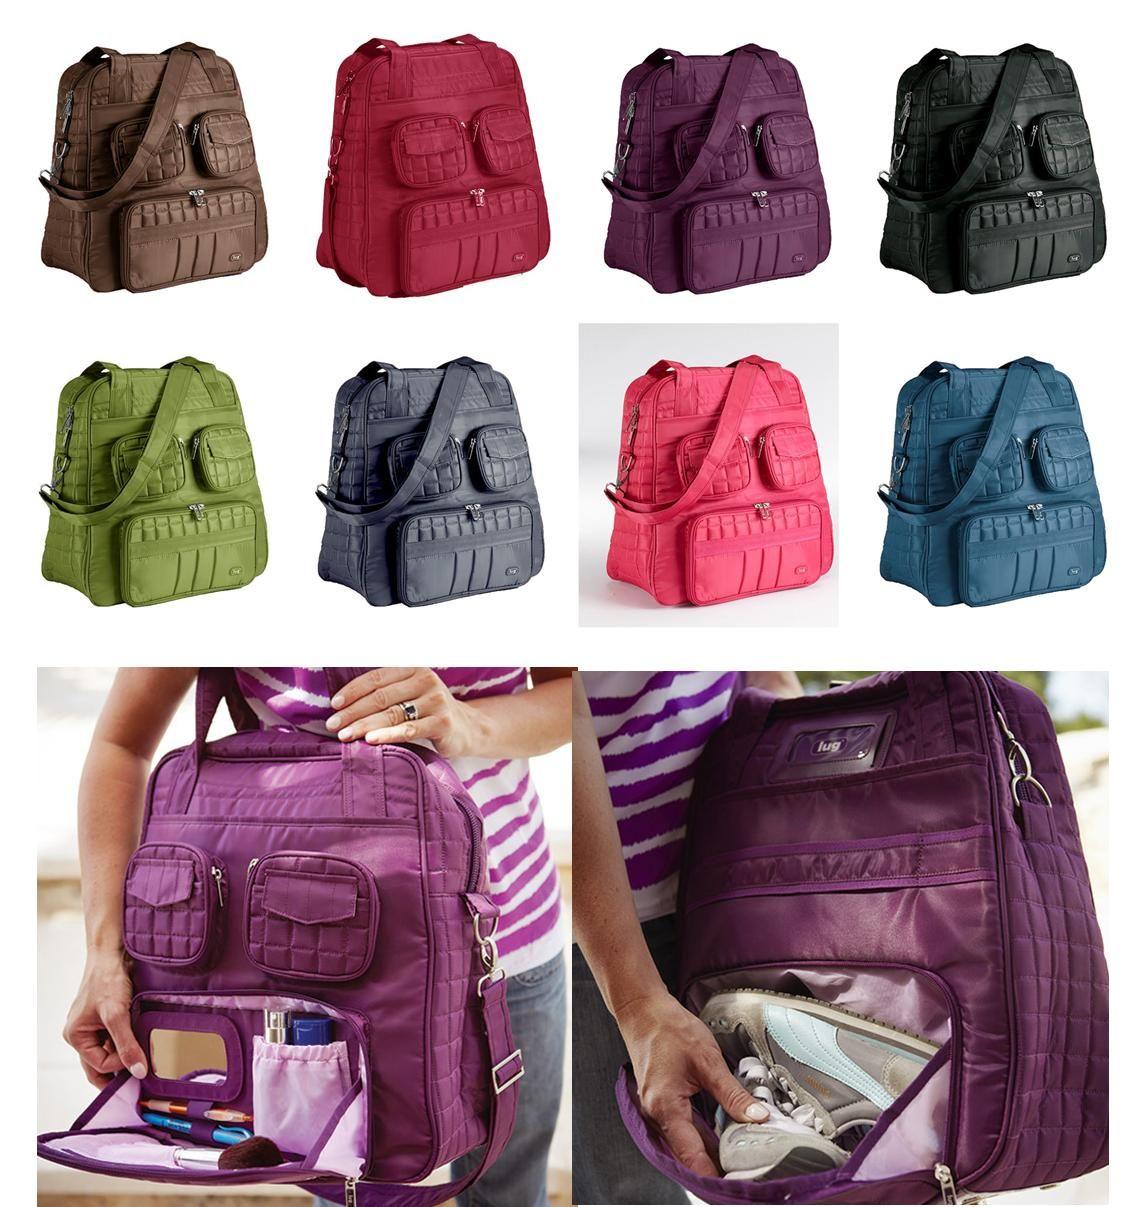 Lug Bags Puddle Jumper Gym Bag On Oprah S O List